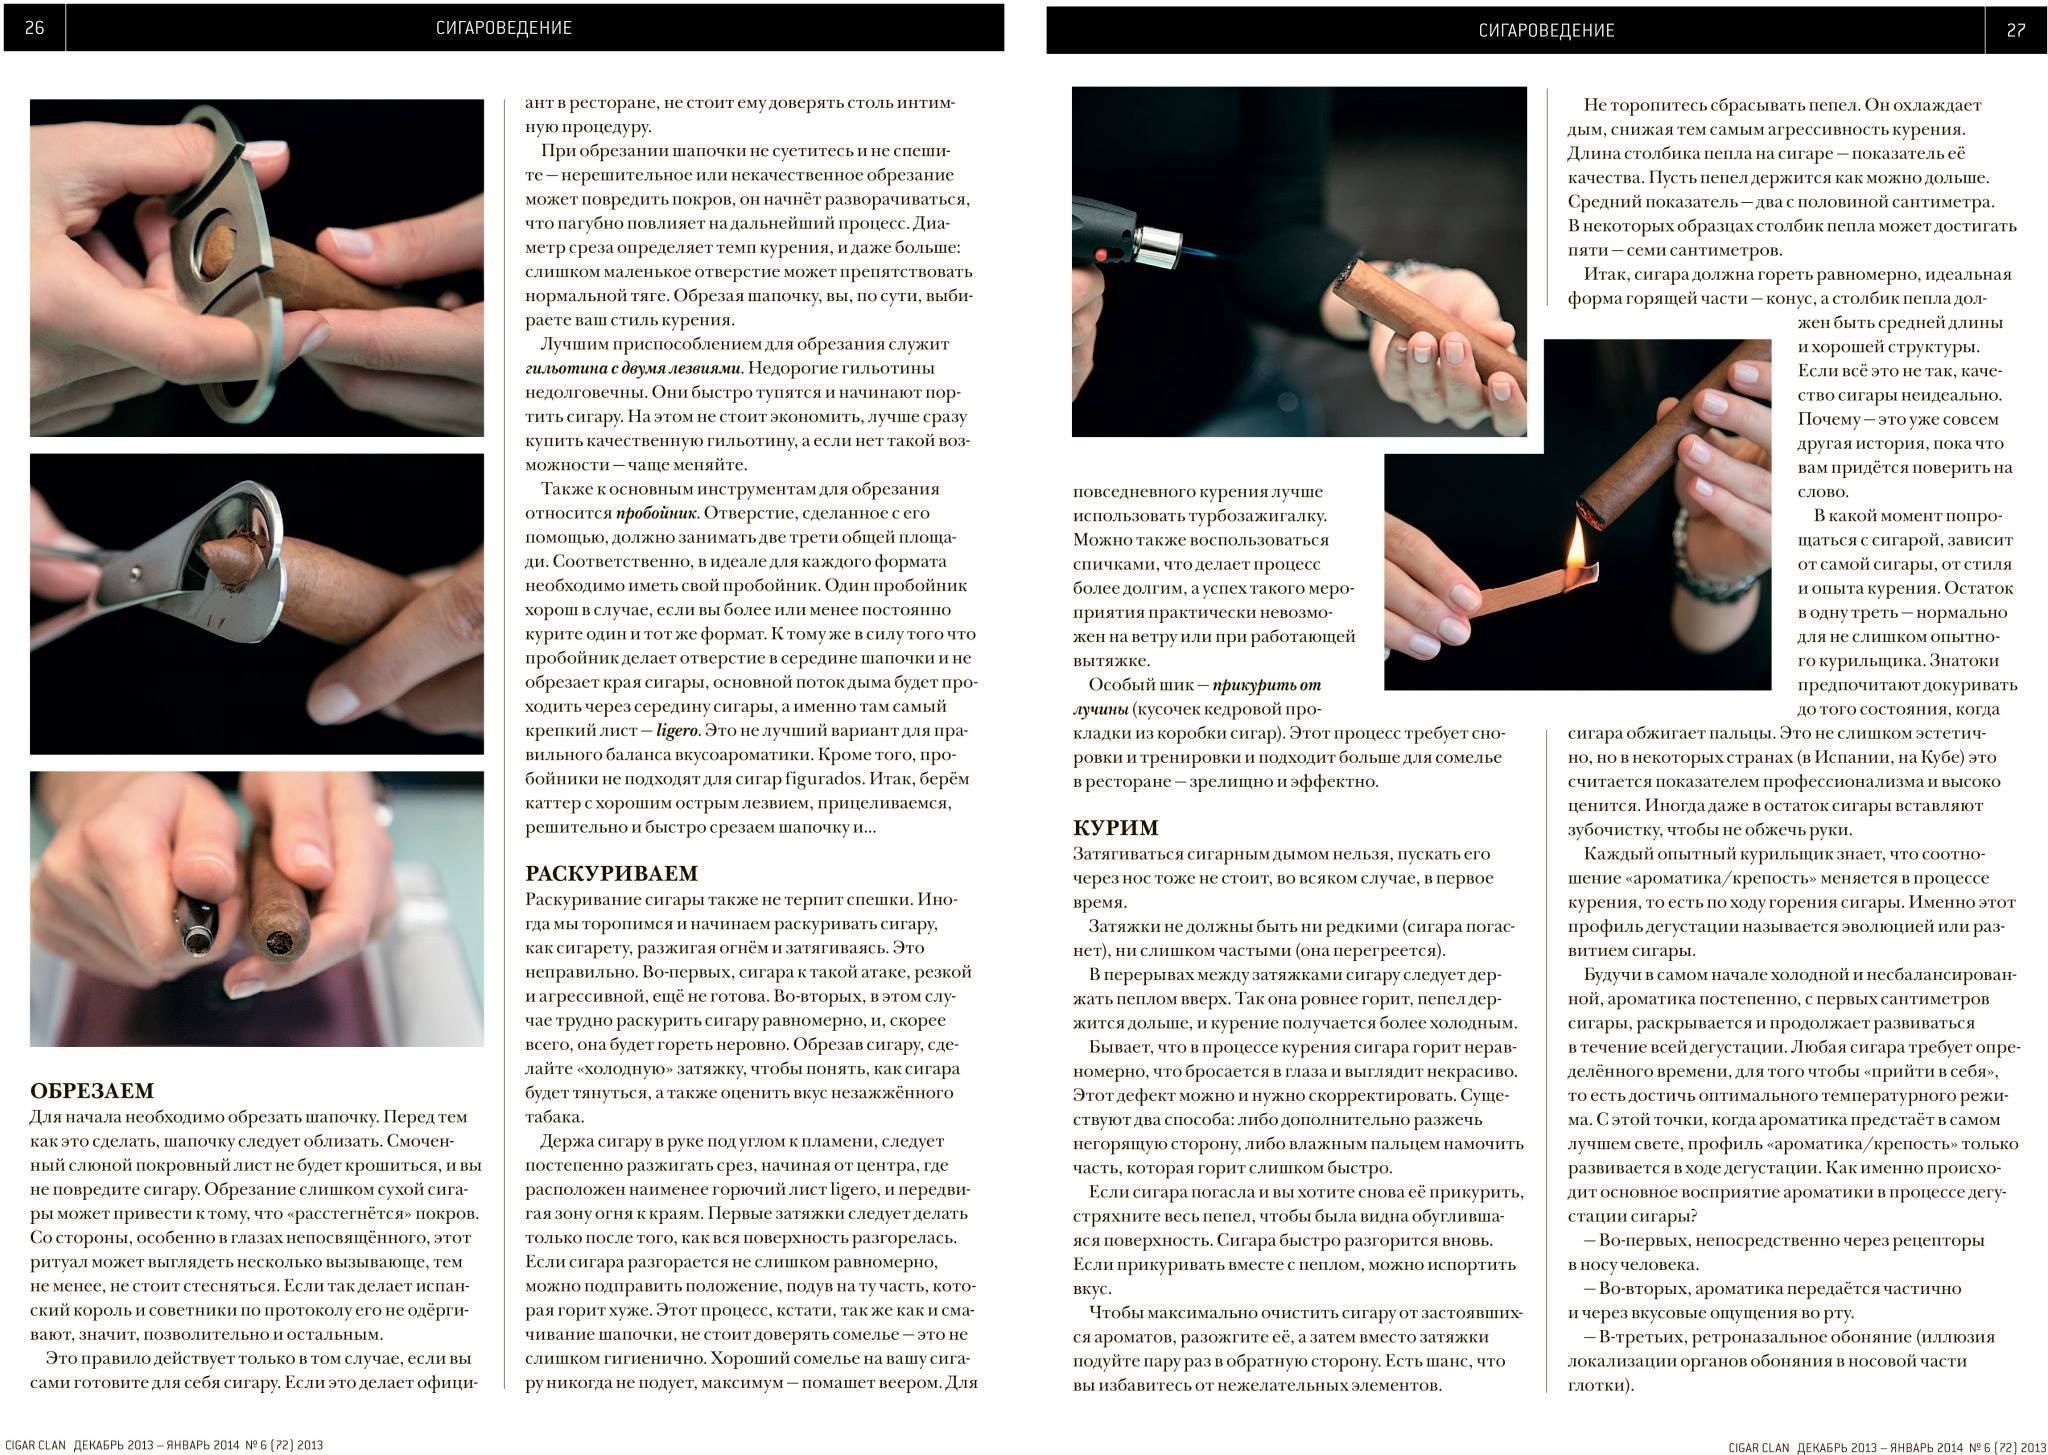 russian_cigar_magazine_cigar_clan_cigar_2.jpg